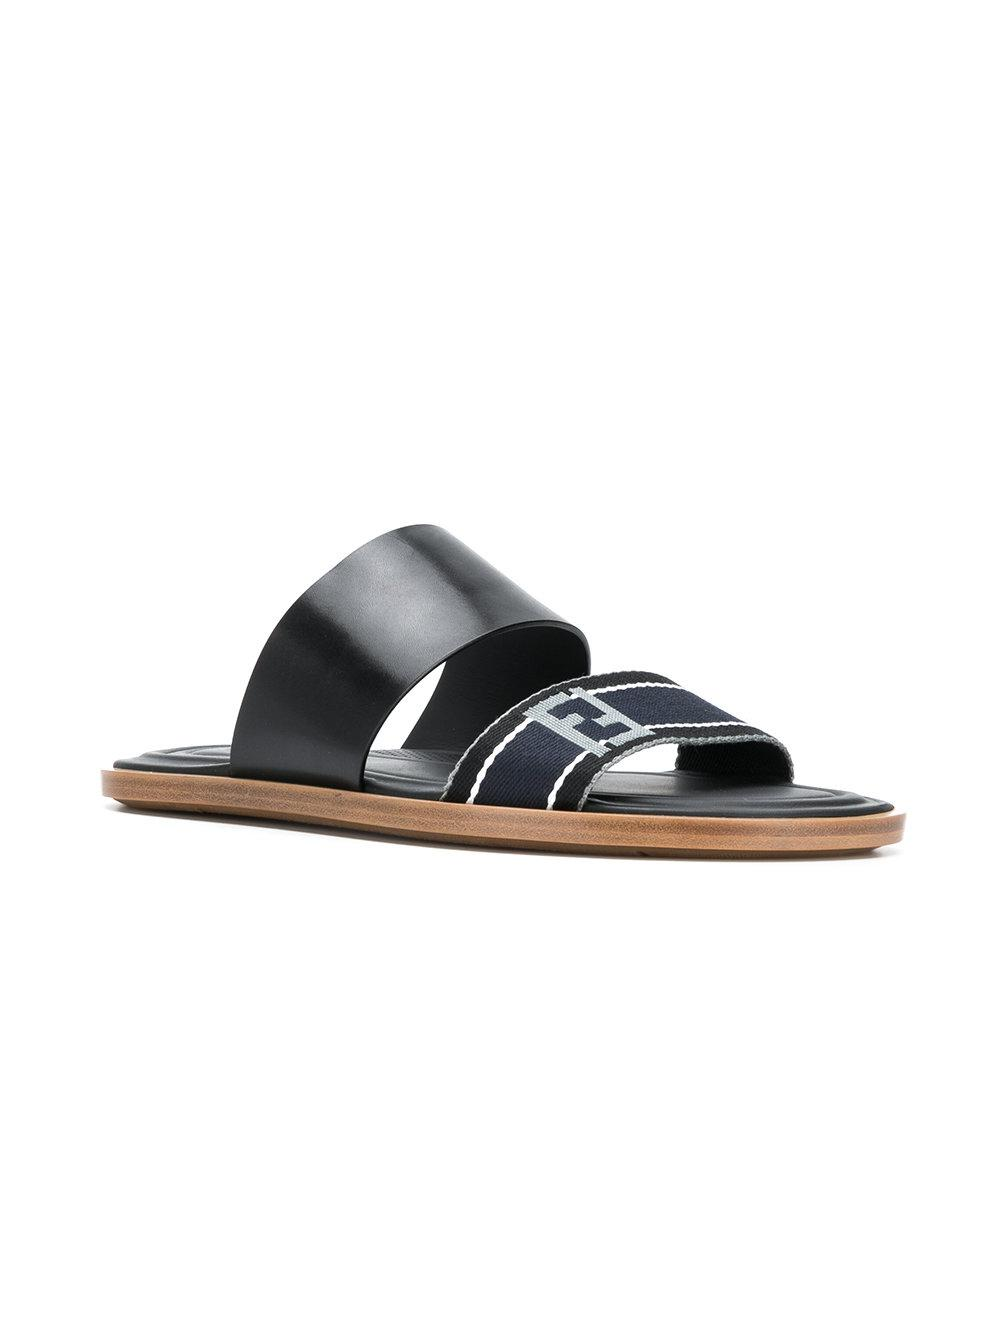 cabf26d2248bea Lyst - Fendi Double Strap Sandals in Black for Men